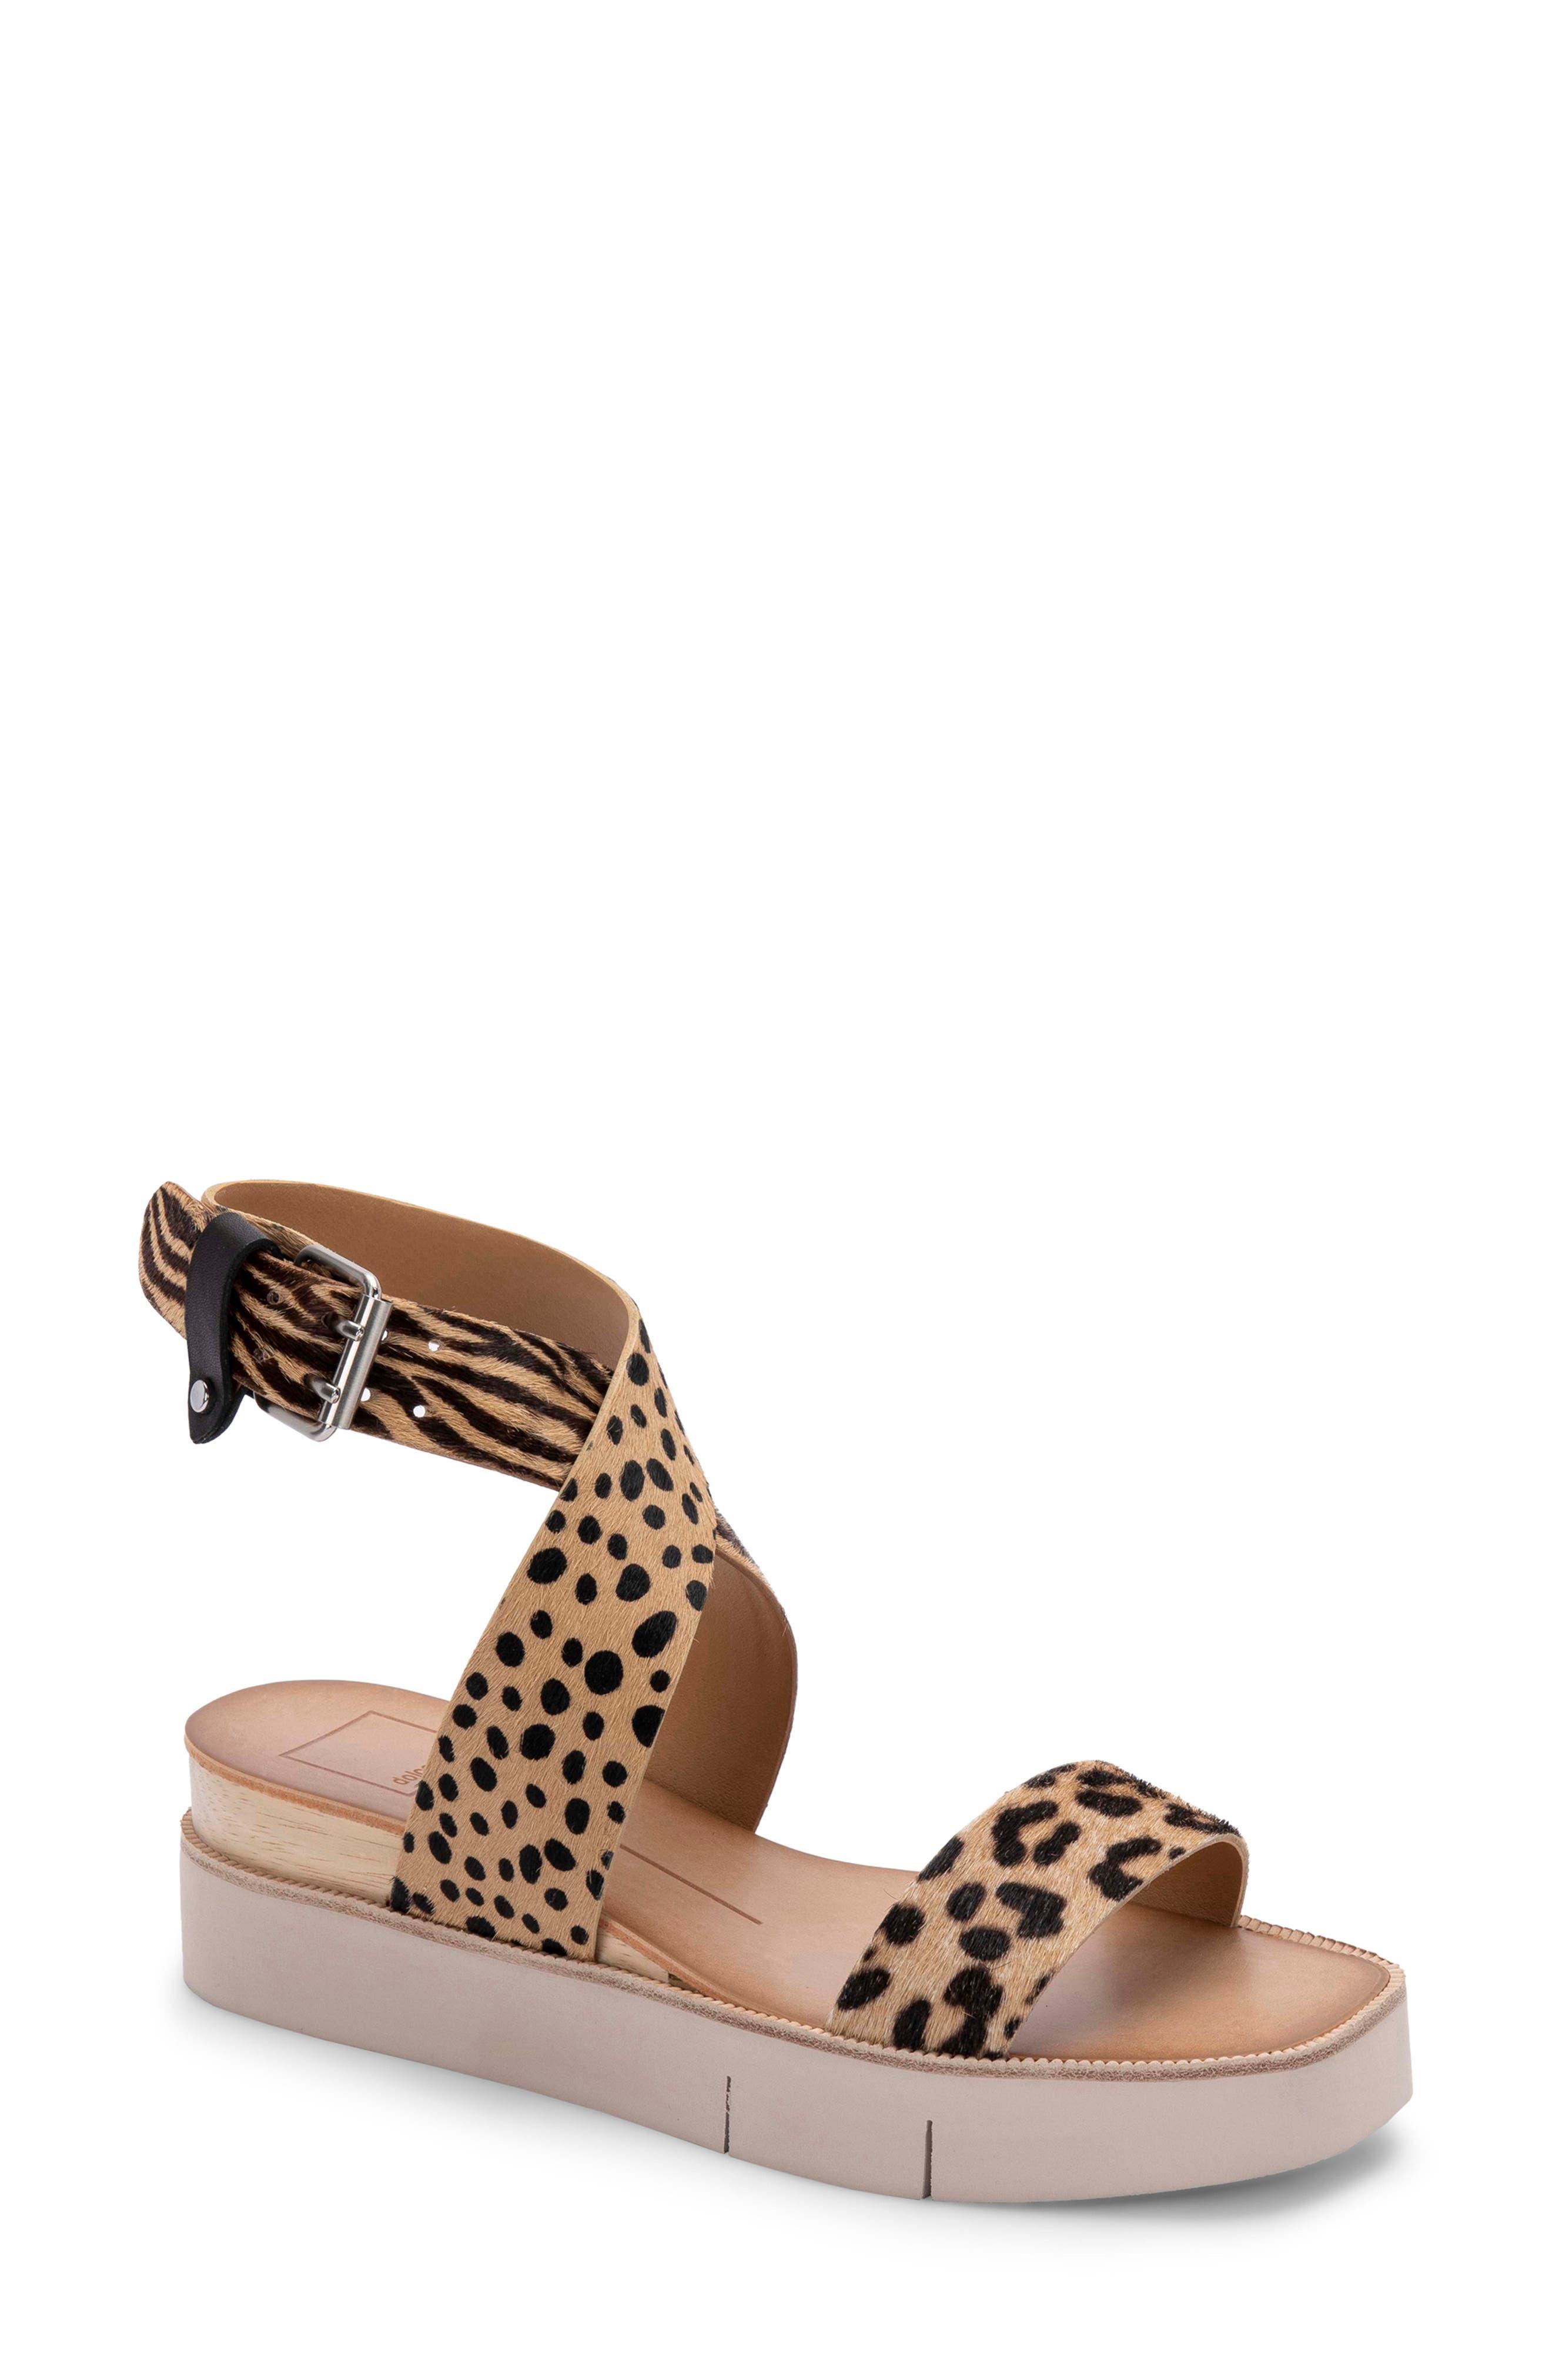 Women's Dolce Vita Panko Platform Sandal